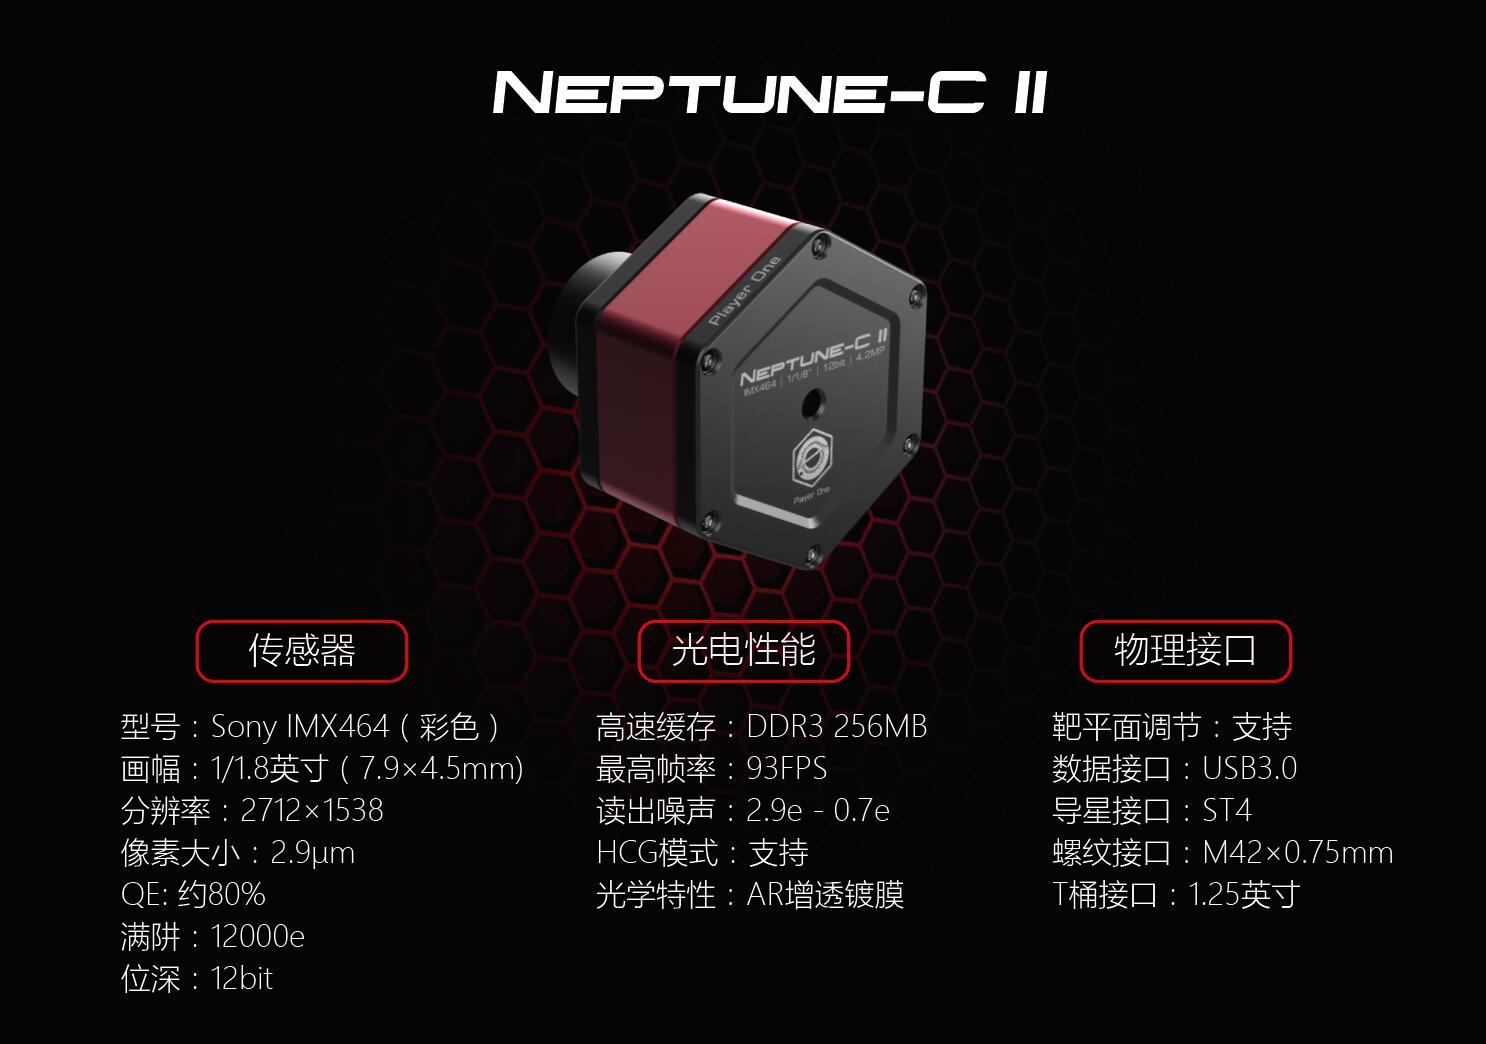 Neptune-C II camera CN.jpg